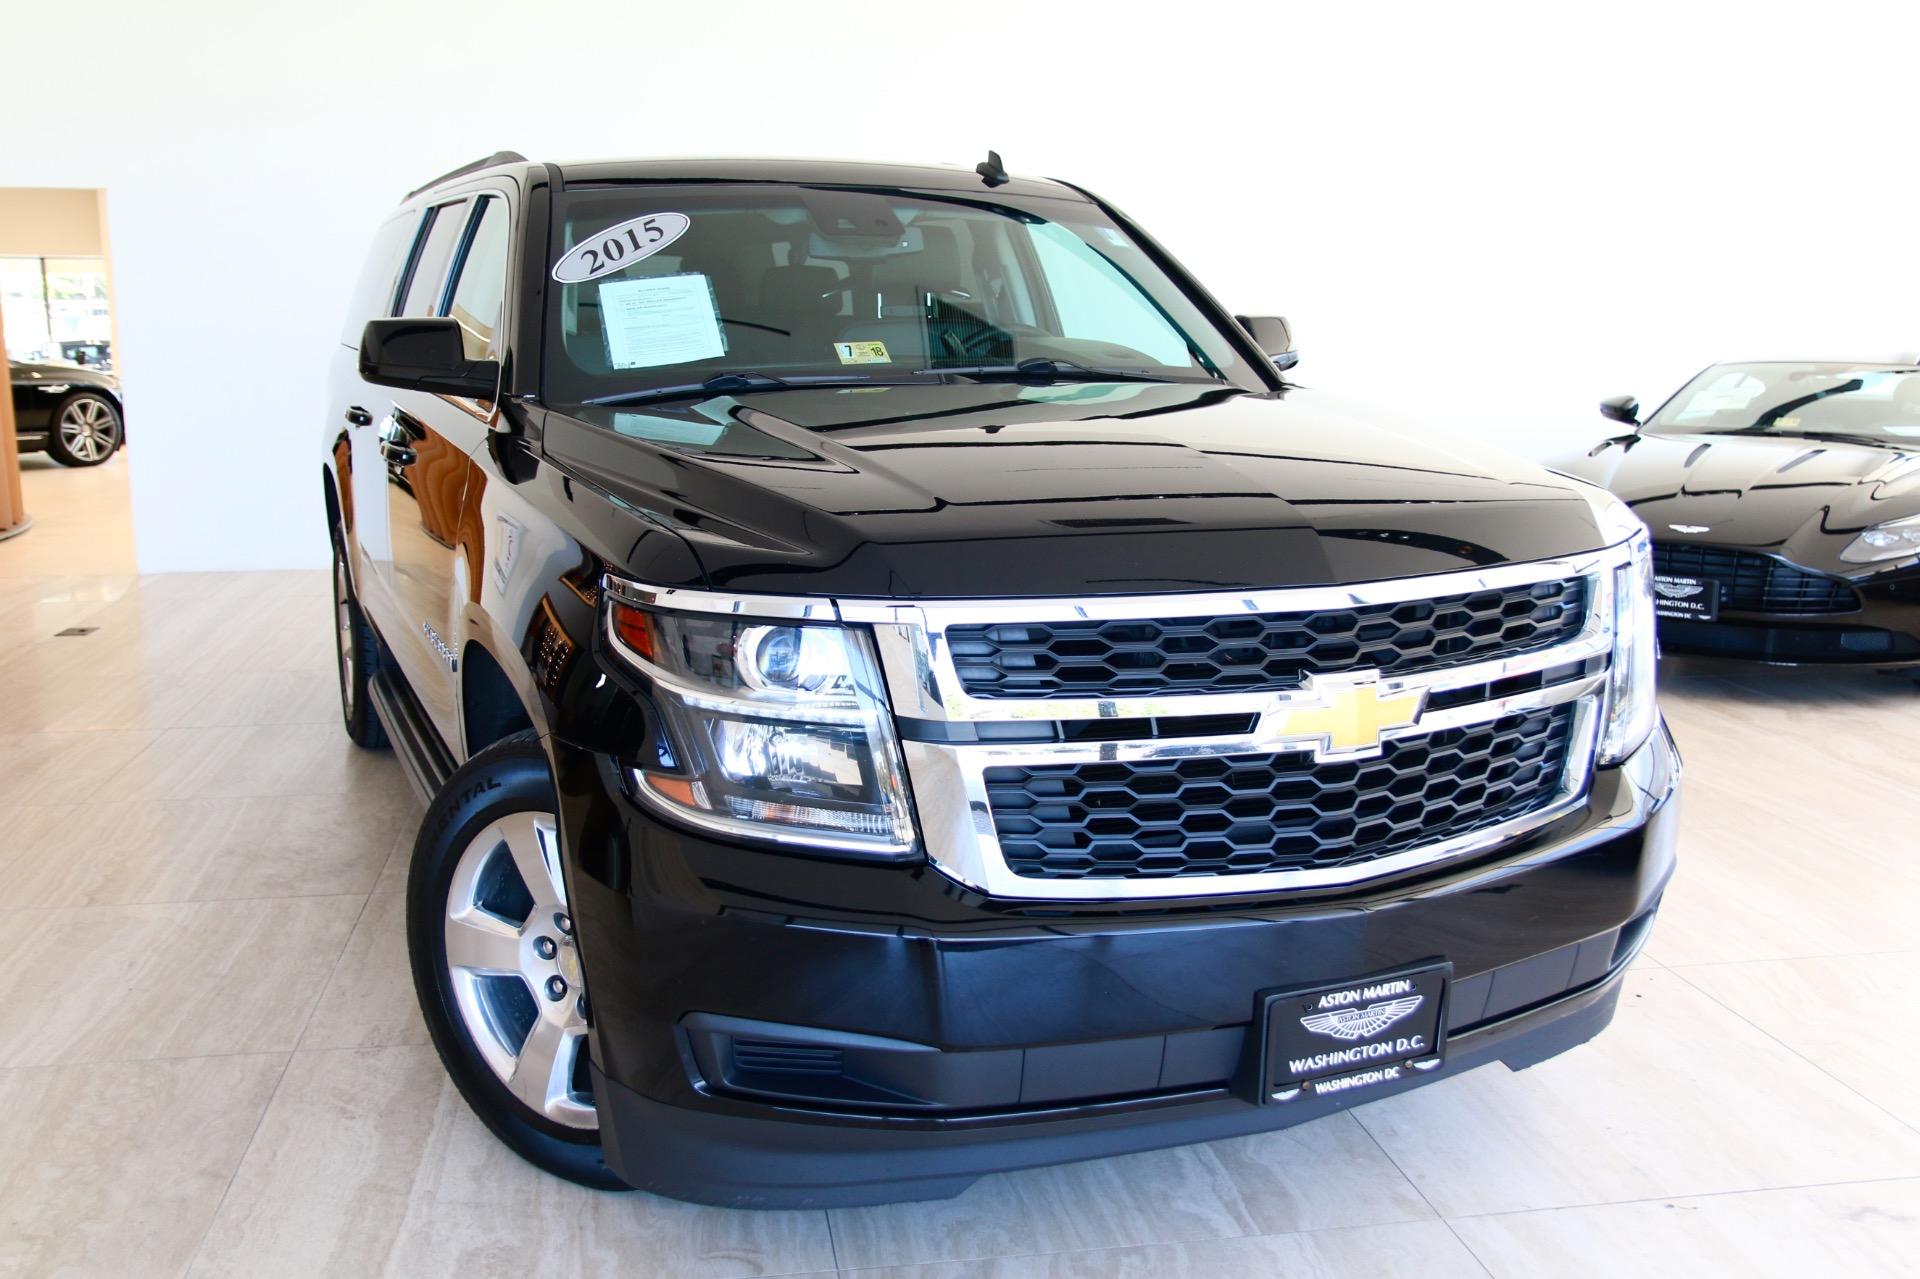 2015 Chevrolet Suburban LT 1500 Stock # P694771A for sale near ...